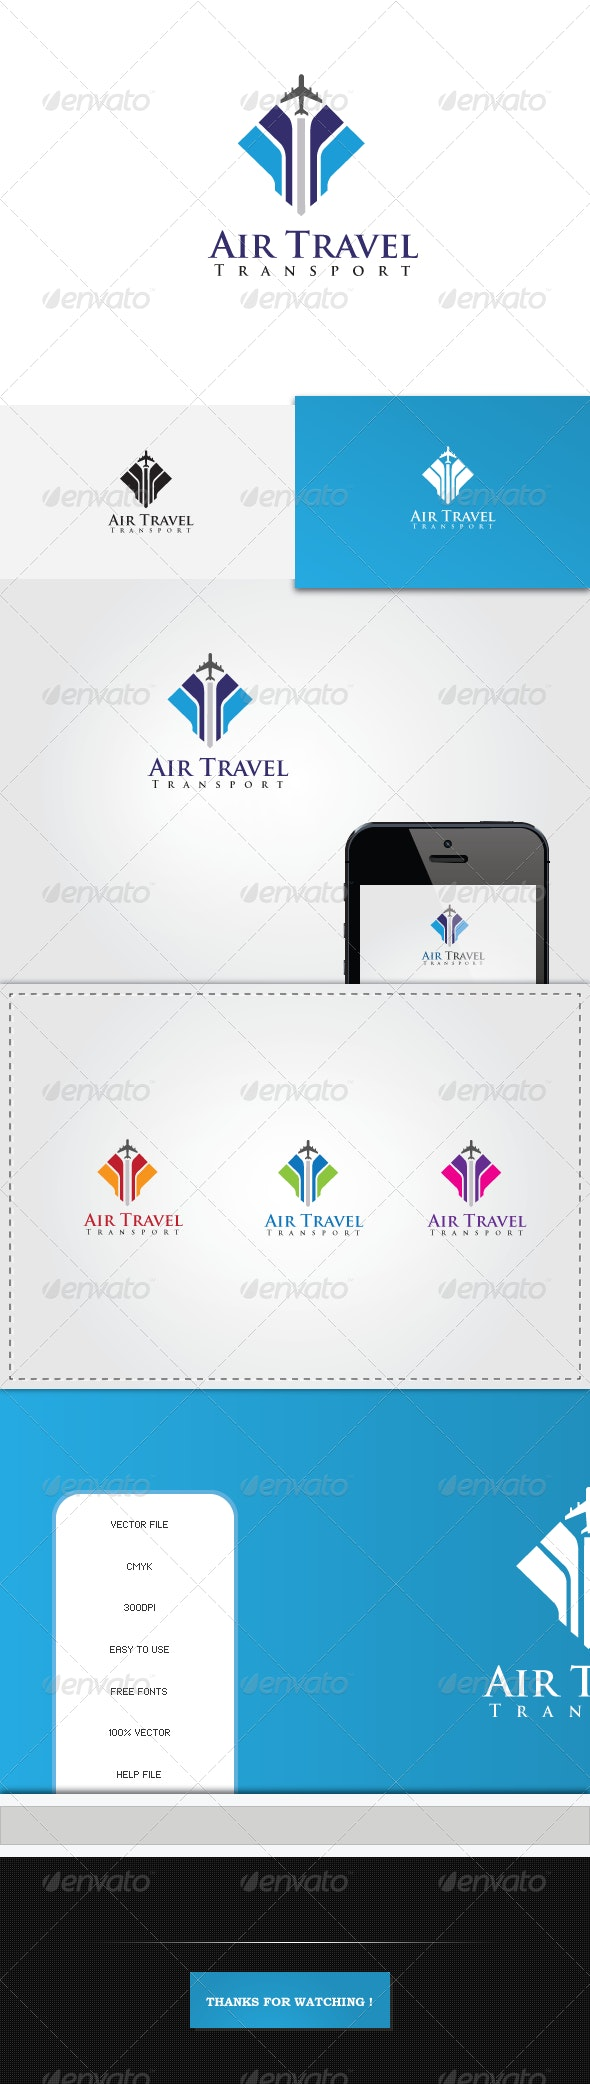 Air Travel Transport